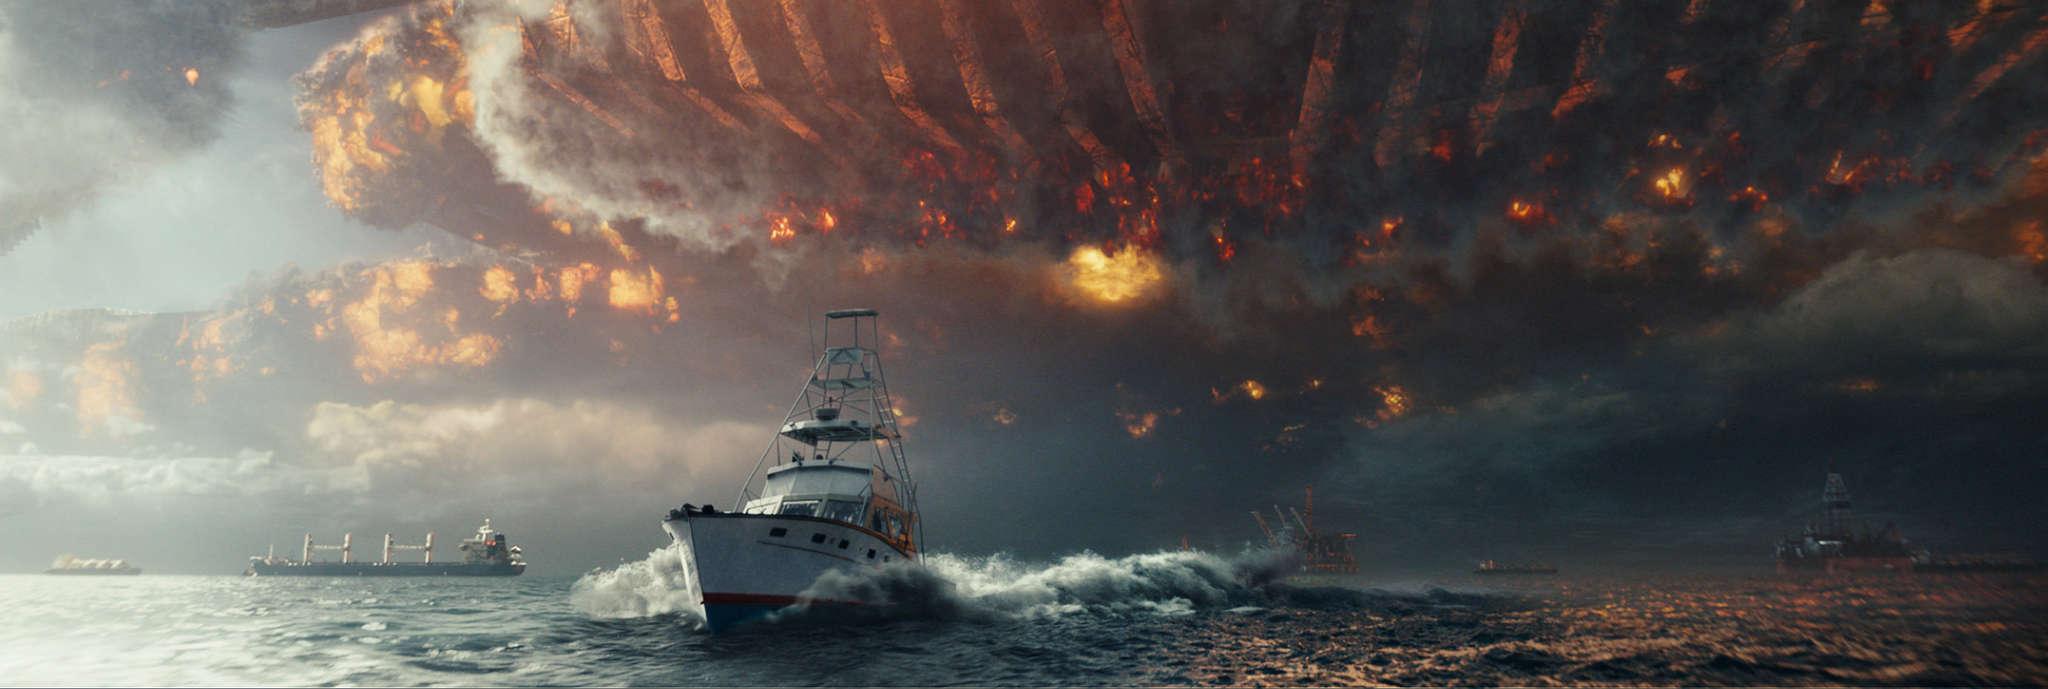 """Independence Day: Resurgence"": Alien spaceship wreaks havoc."